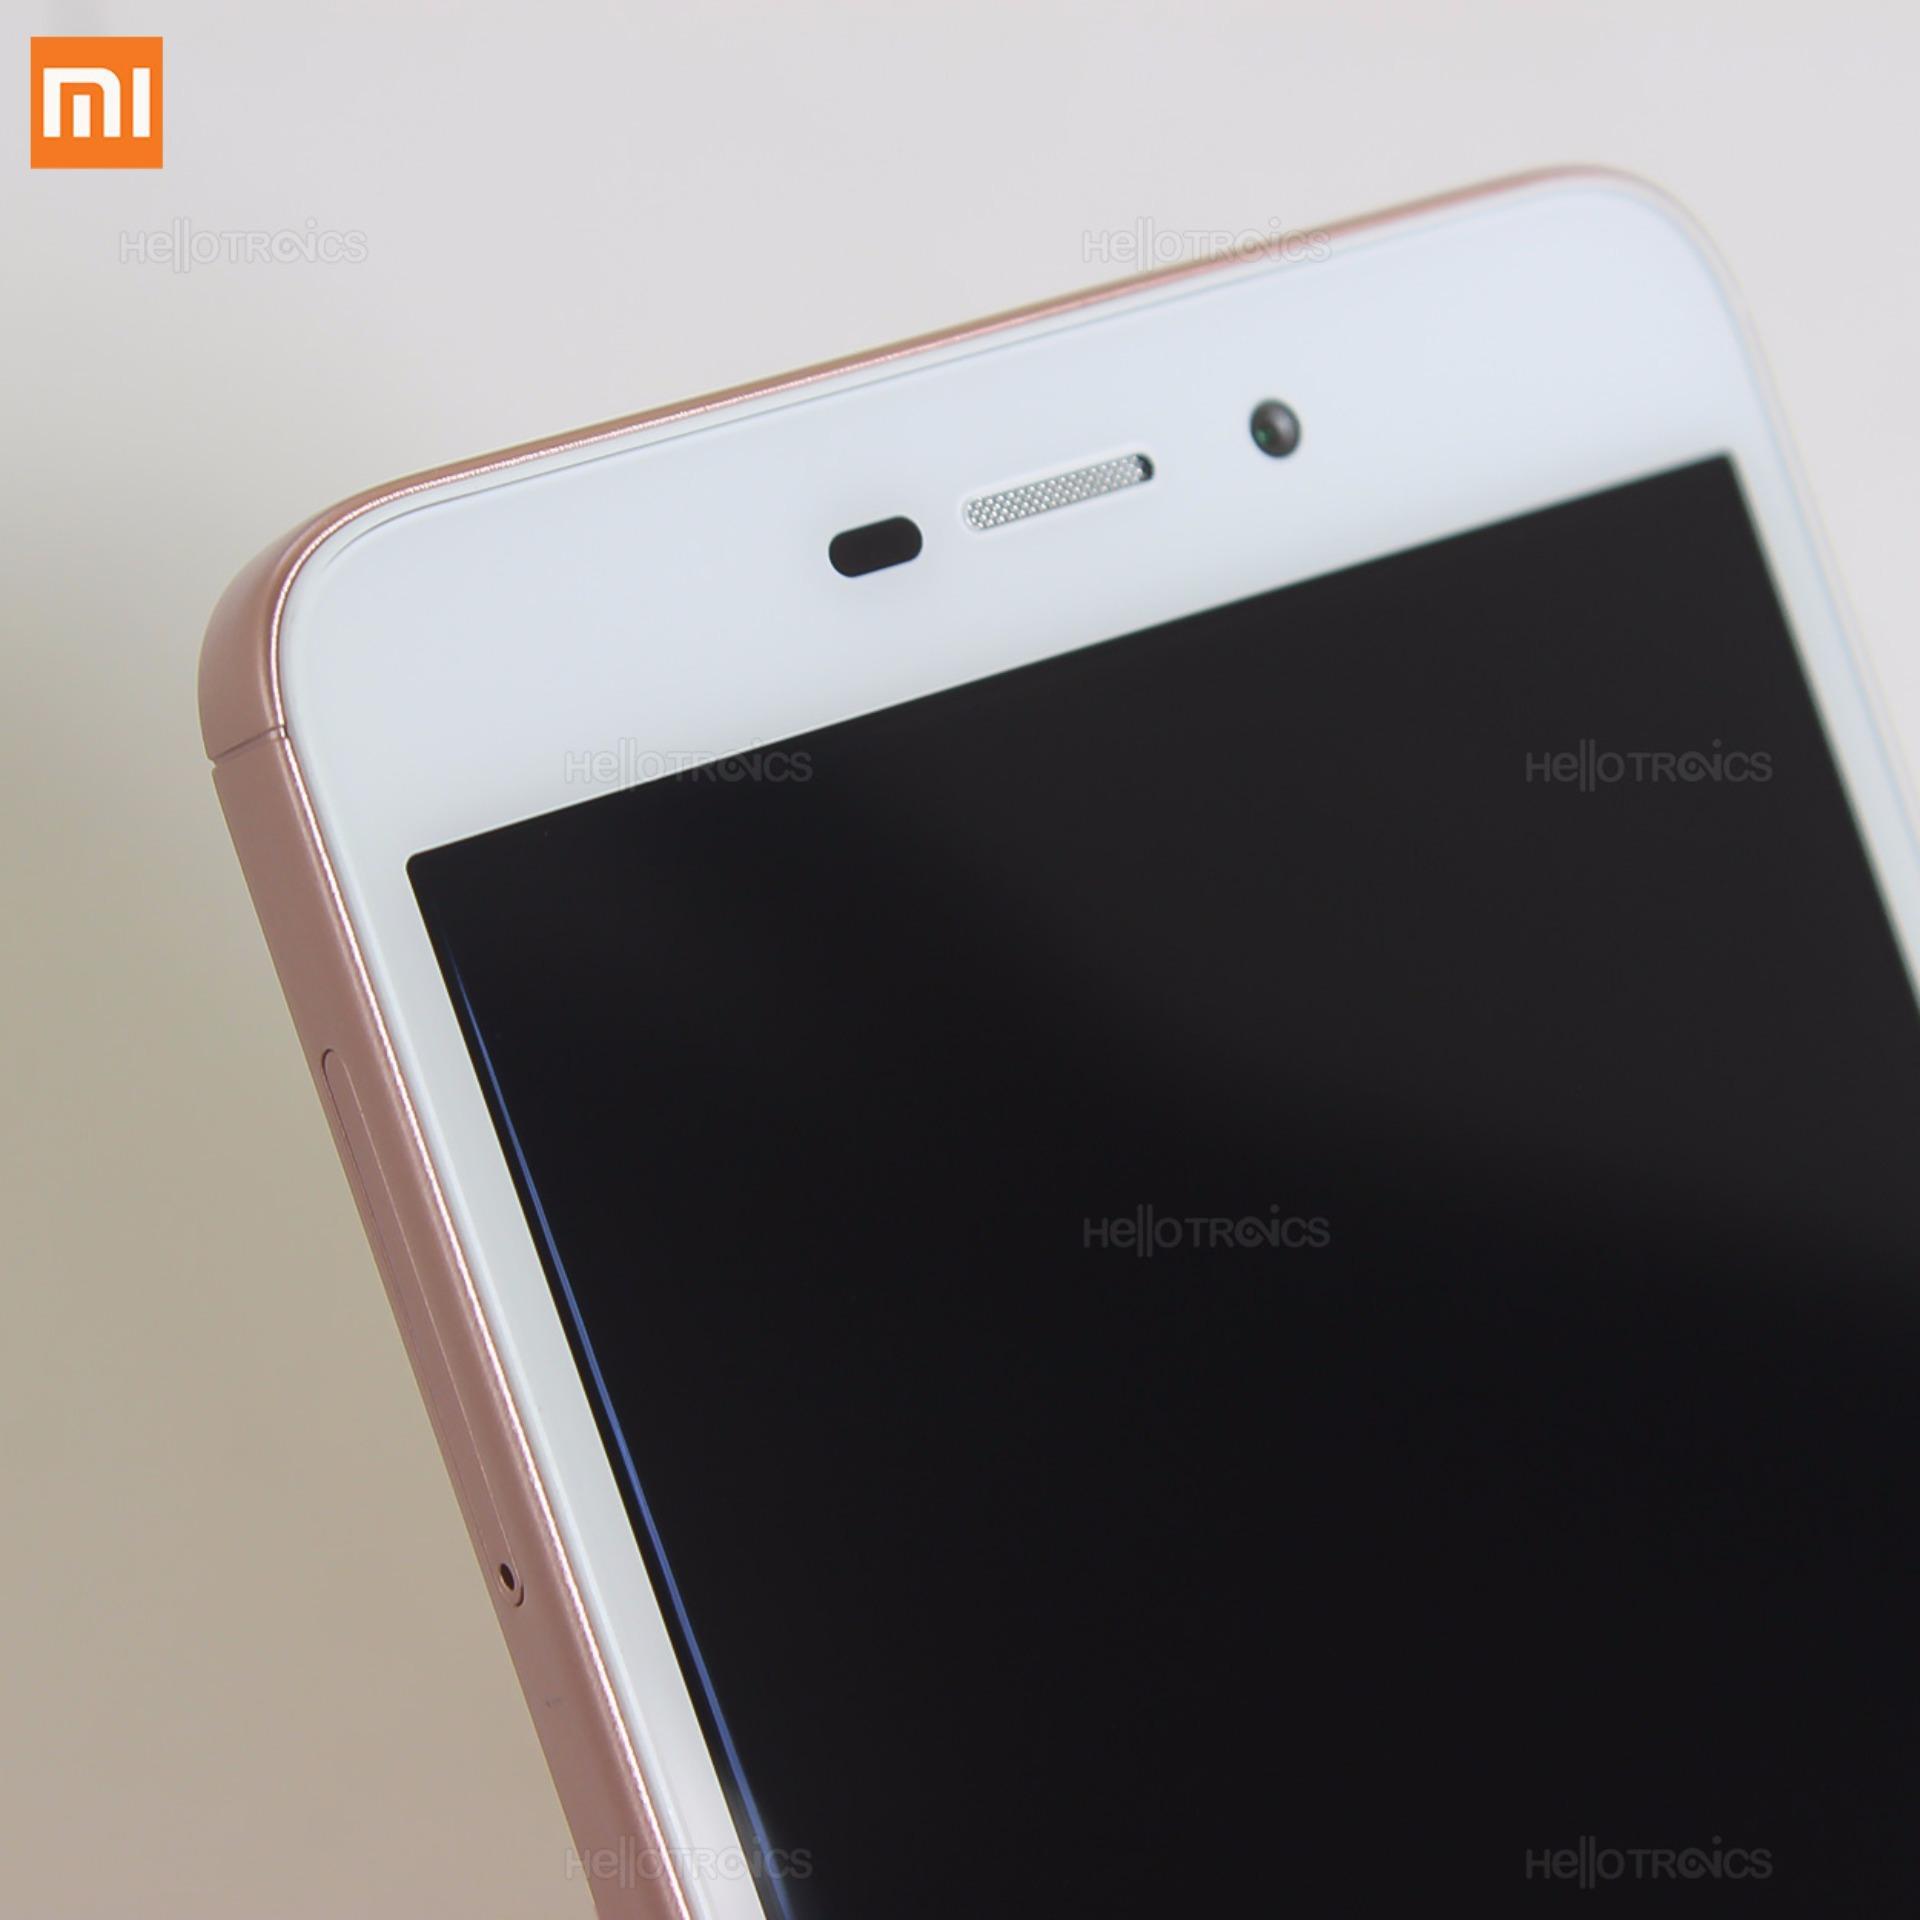 Philippines Xiaomi Redmi 4a 2gb Ram 16gb Rom Rose Gold Best Budget 2